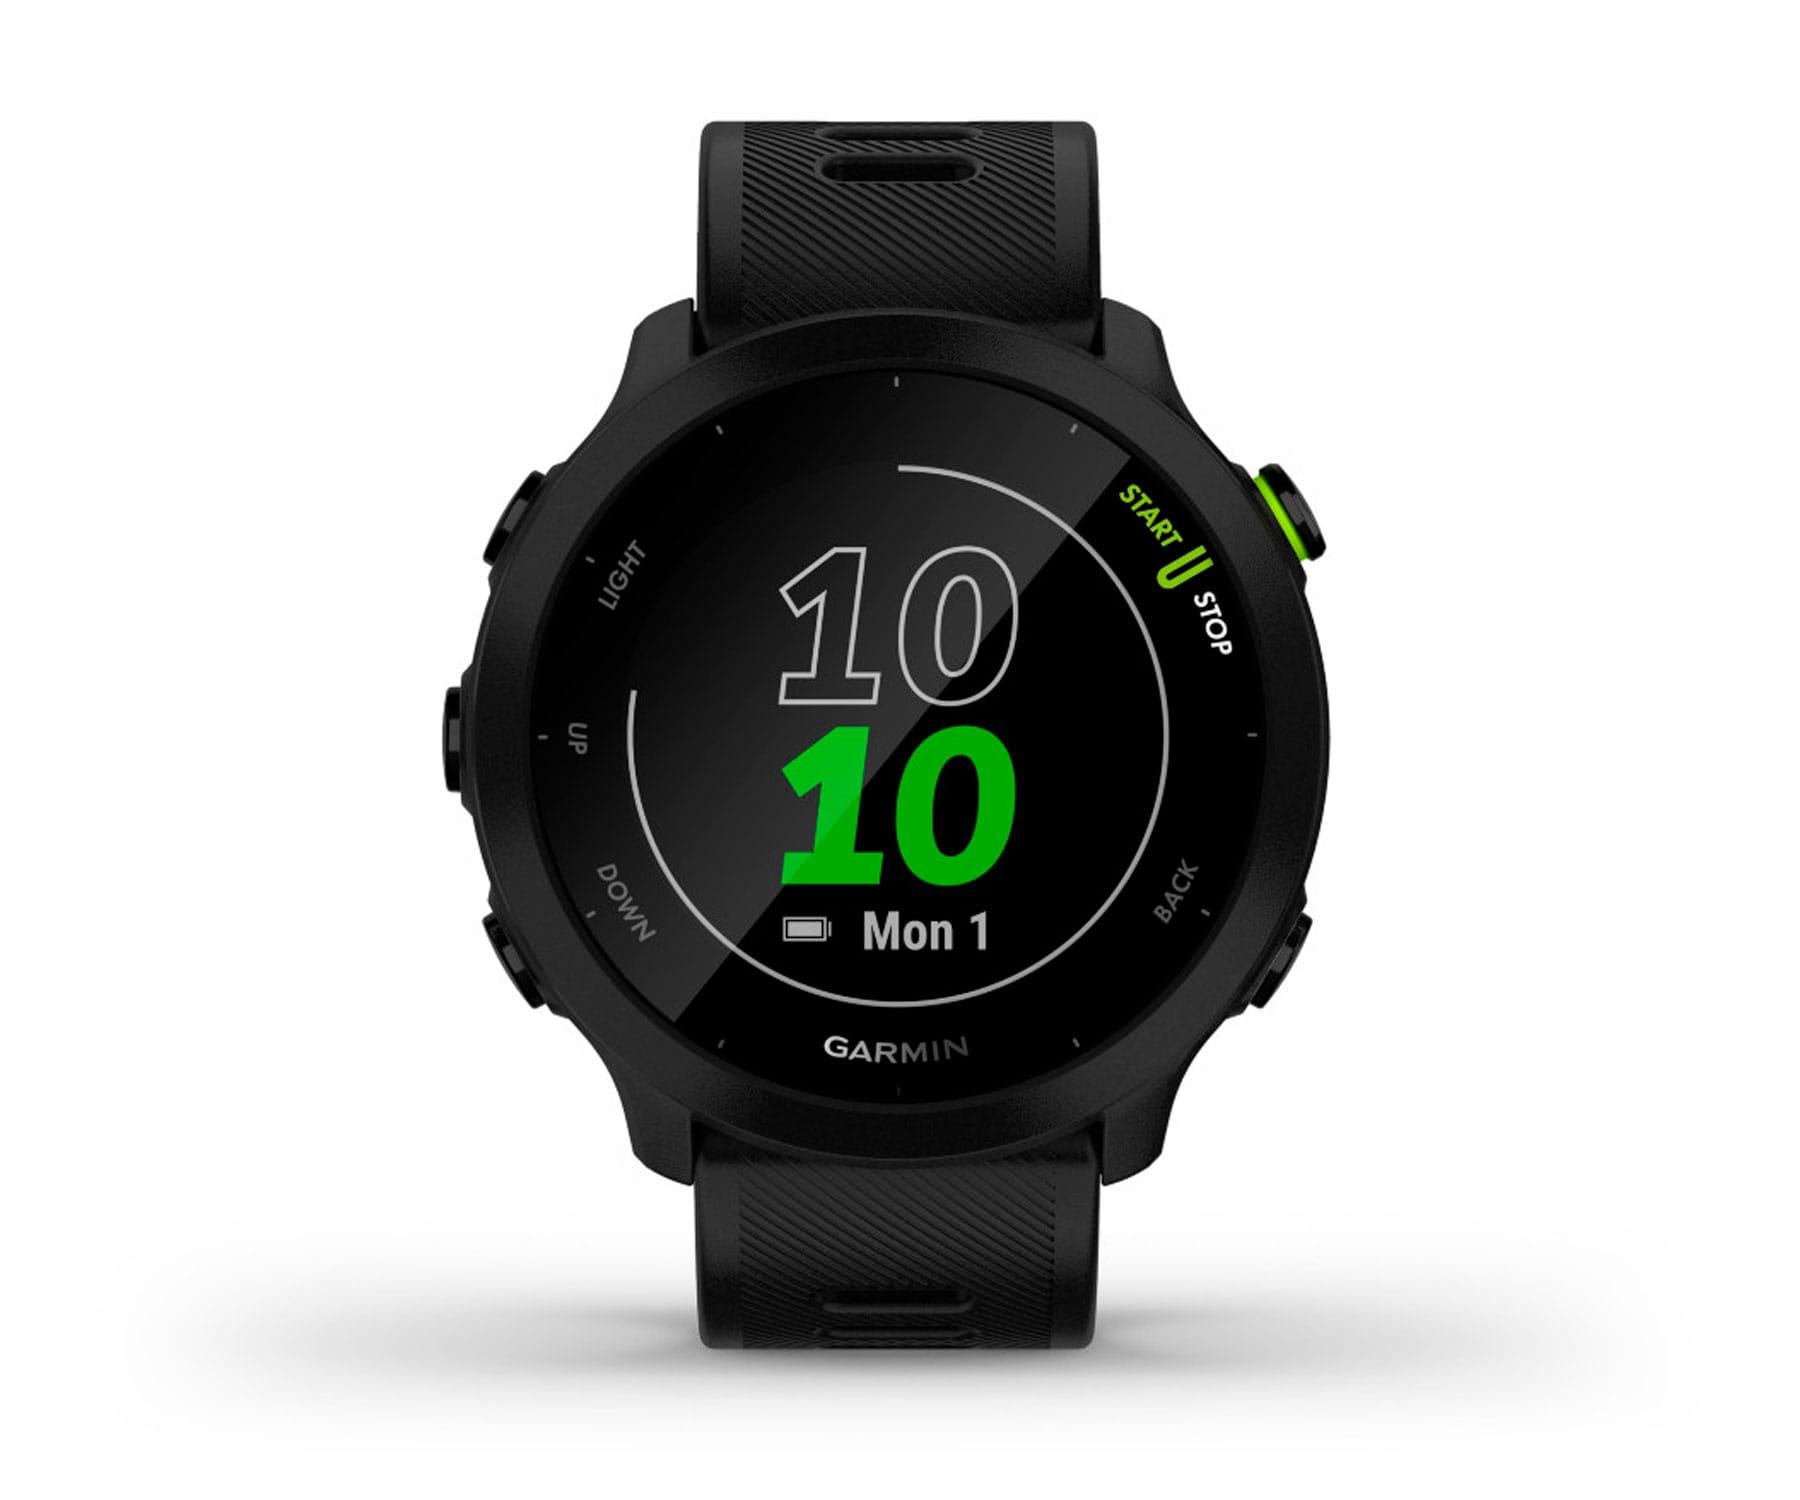 Garmin Forerunner 55 Negro/42mm Reloj inteligente Running/GPS/Monitor de frecuencia cardíaca